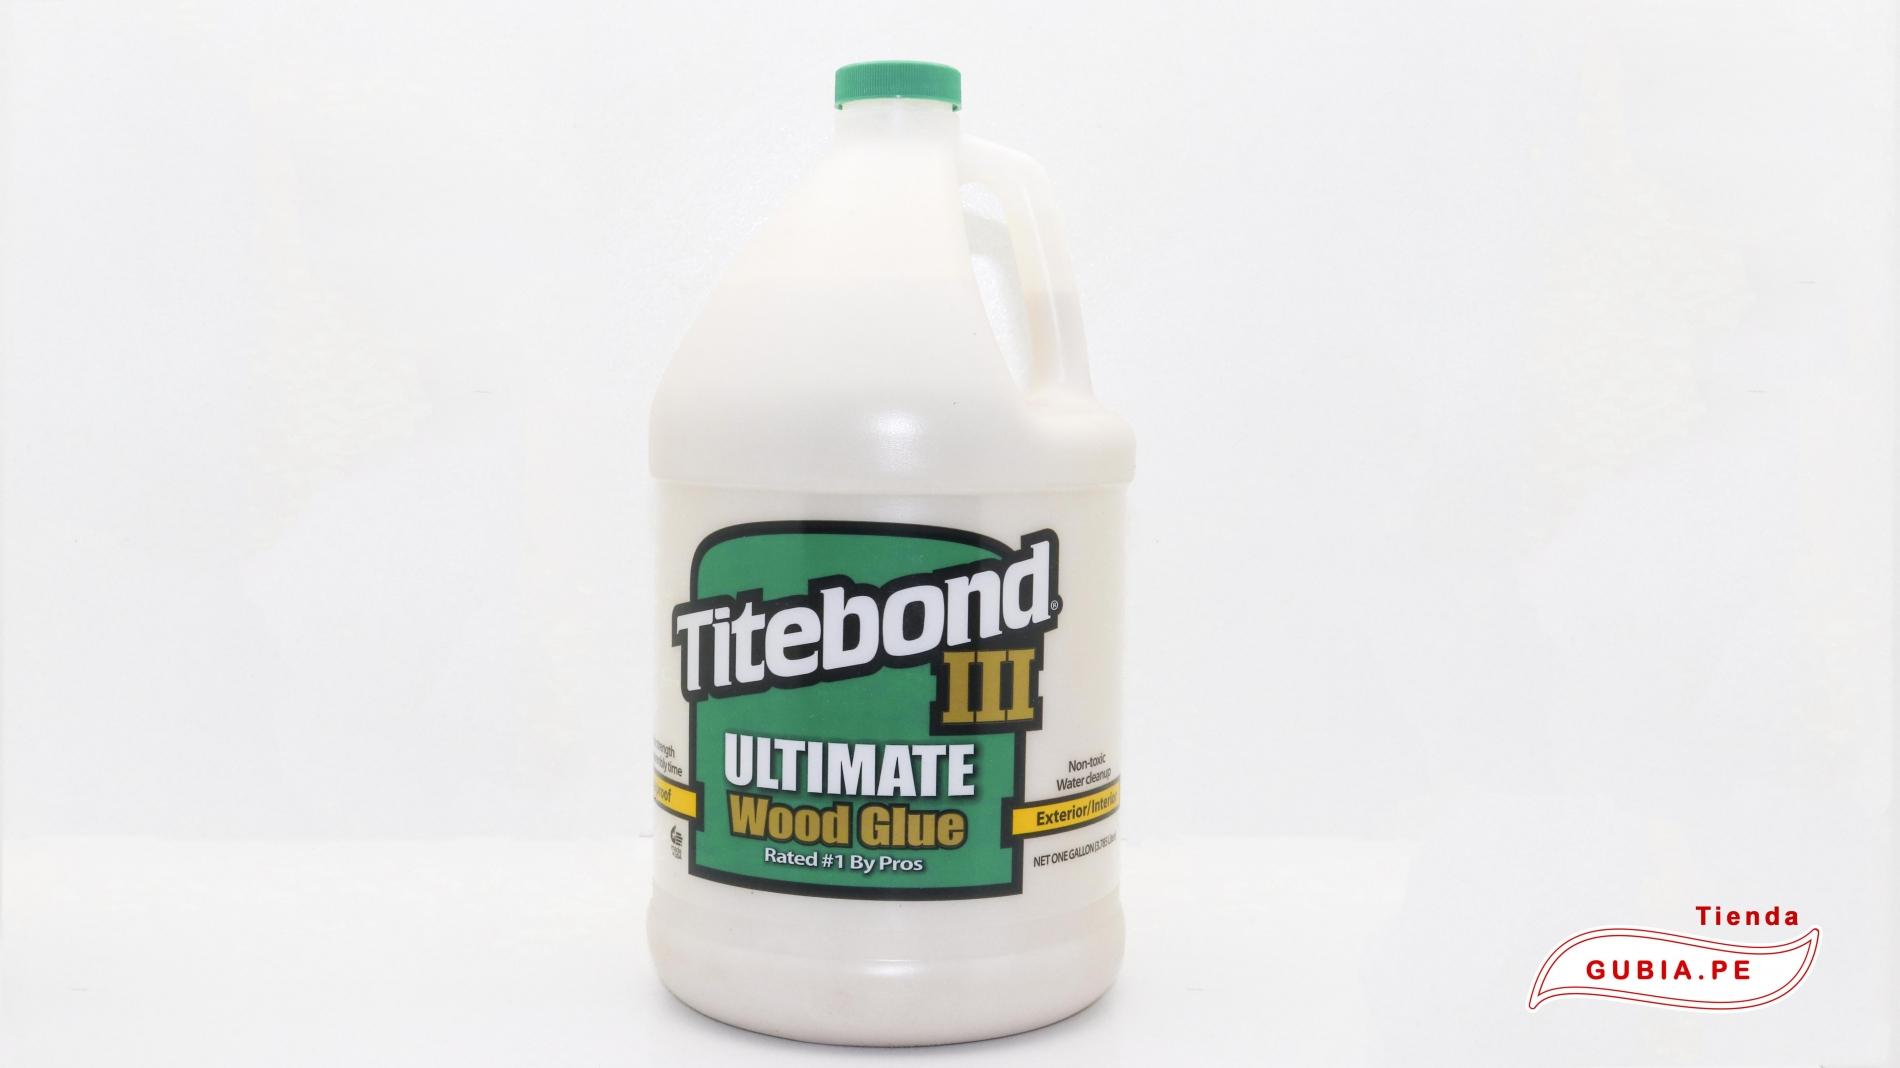 1416-TITEBOND III Ultimate pegamento para madera 3785 ml, 1 Galón 1416-max-1.